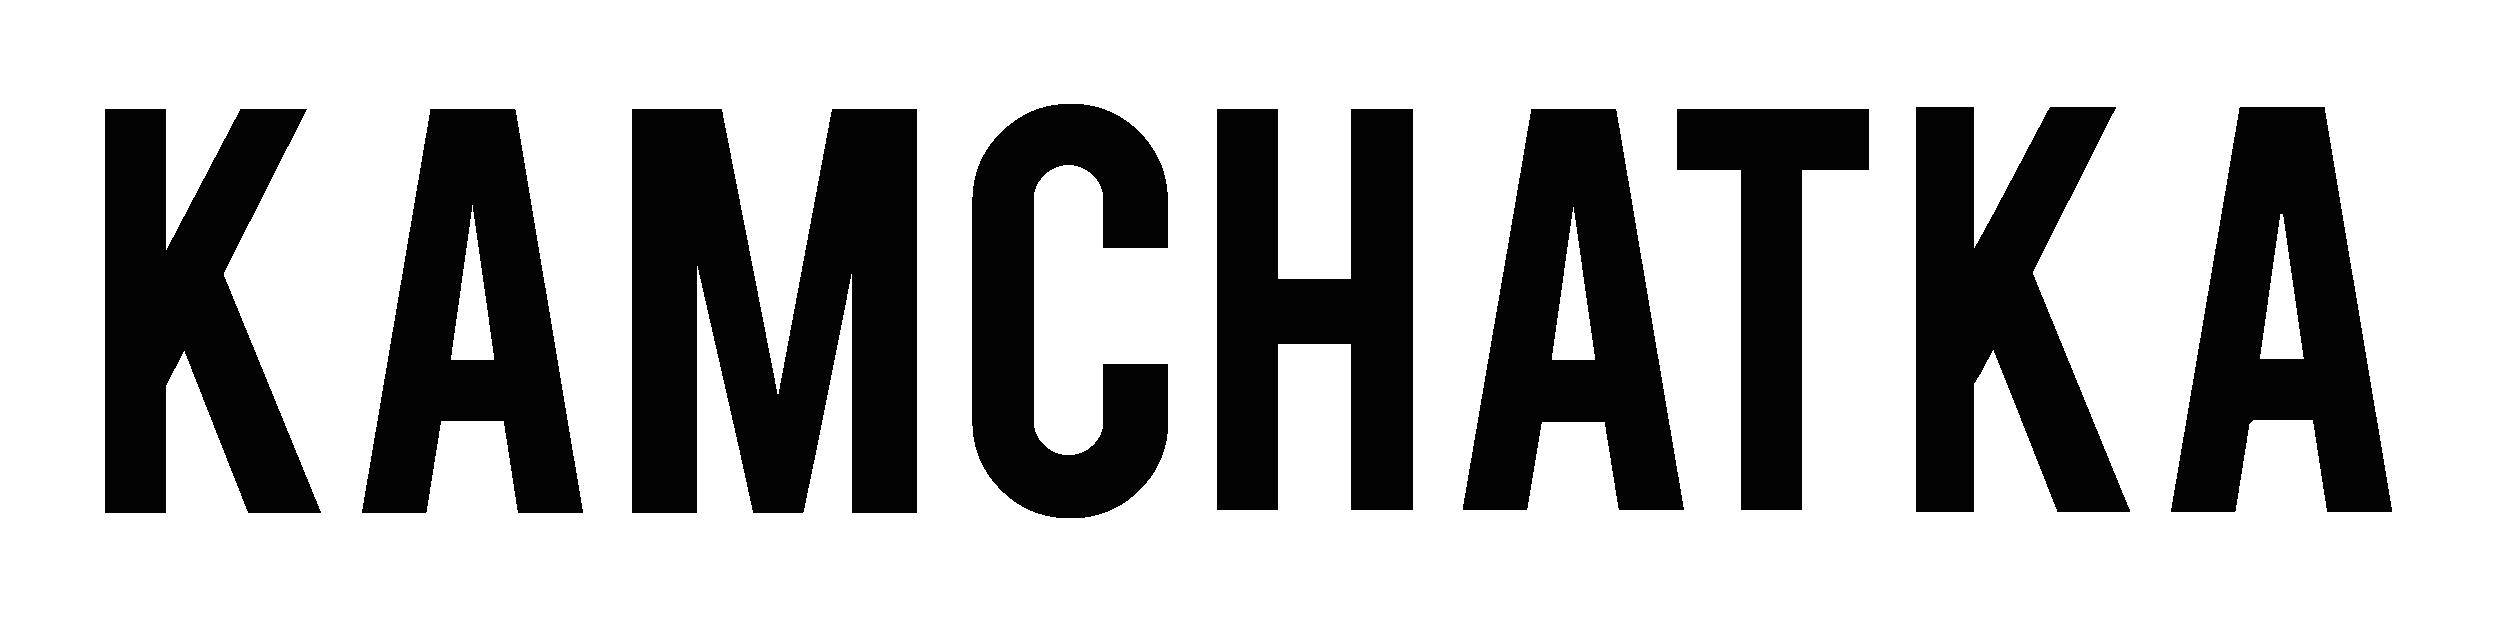 KAMCHATKA: Ideas + Digital + Social Media